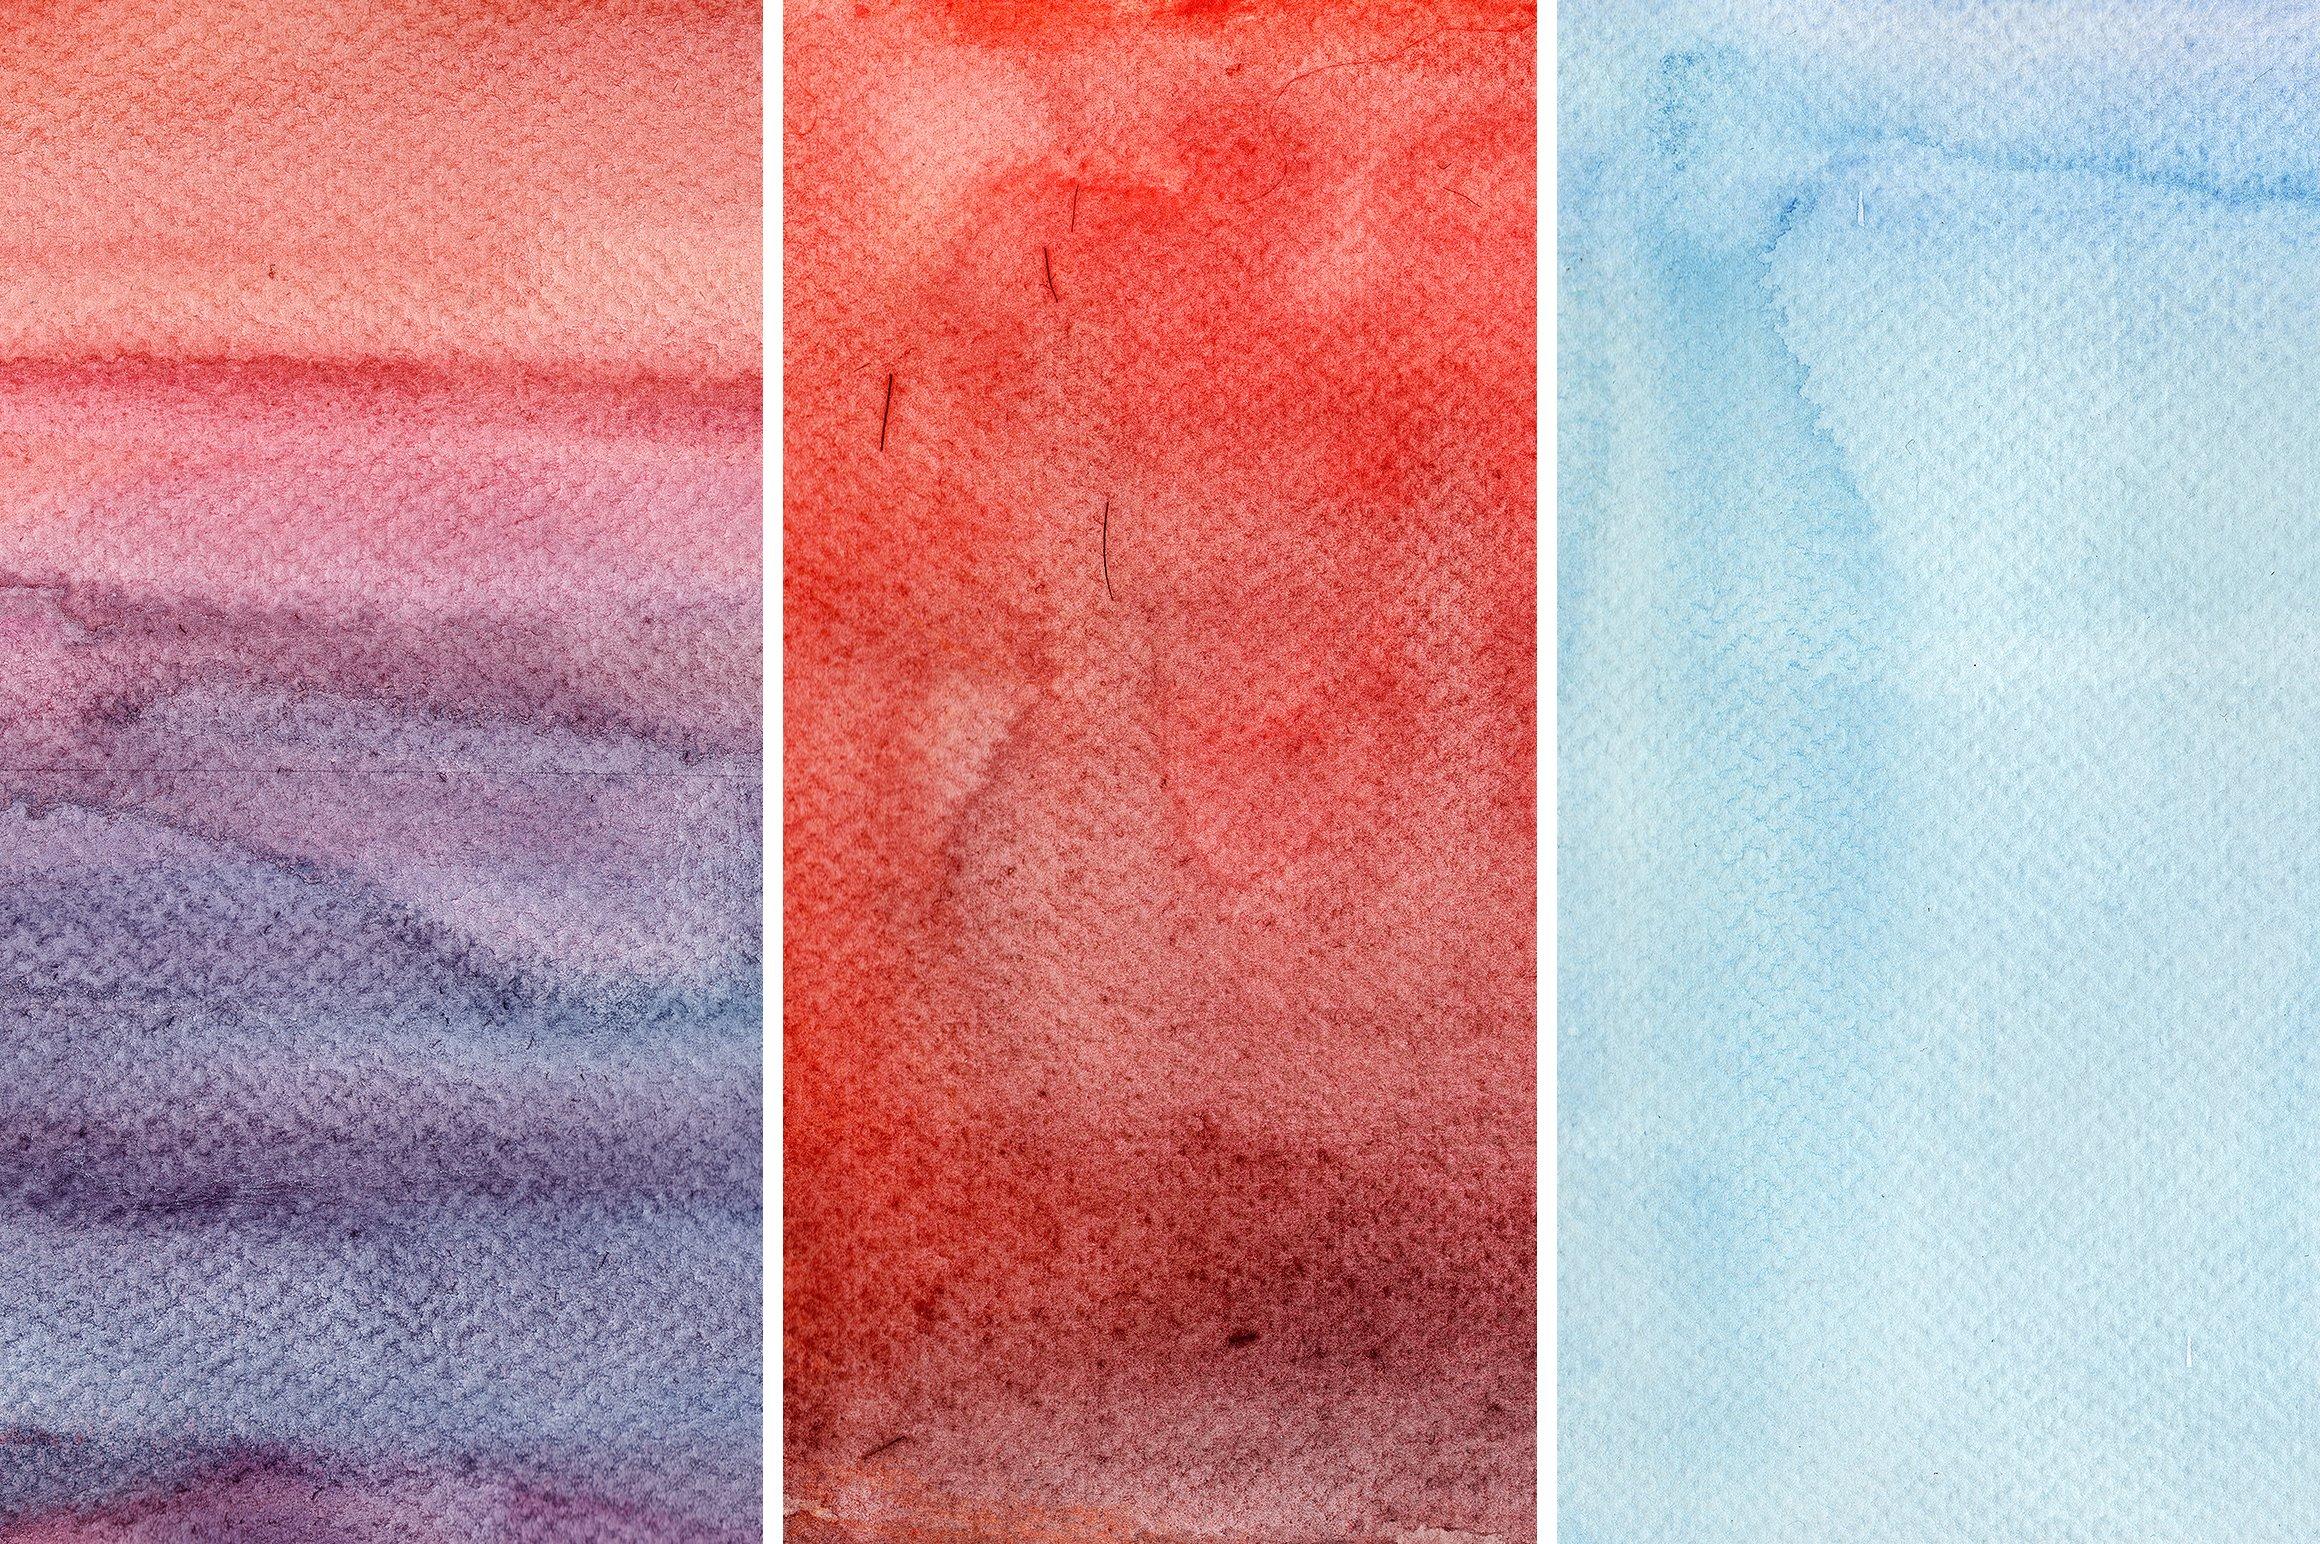 11款高清水彩颜料渗透流动痕迹背景图片素材 Watercolor Washes Textures Volume 01插图(2)